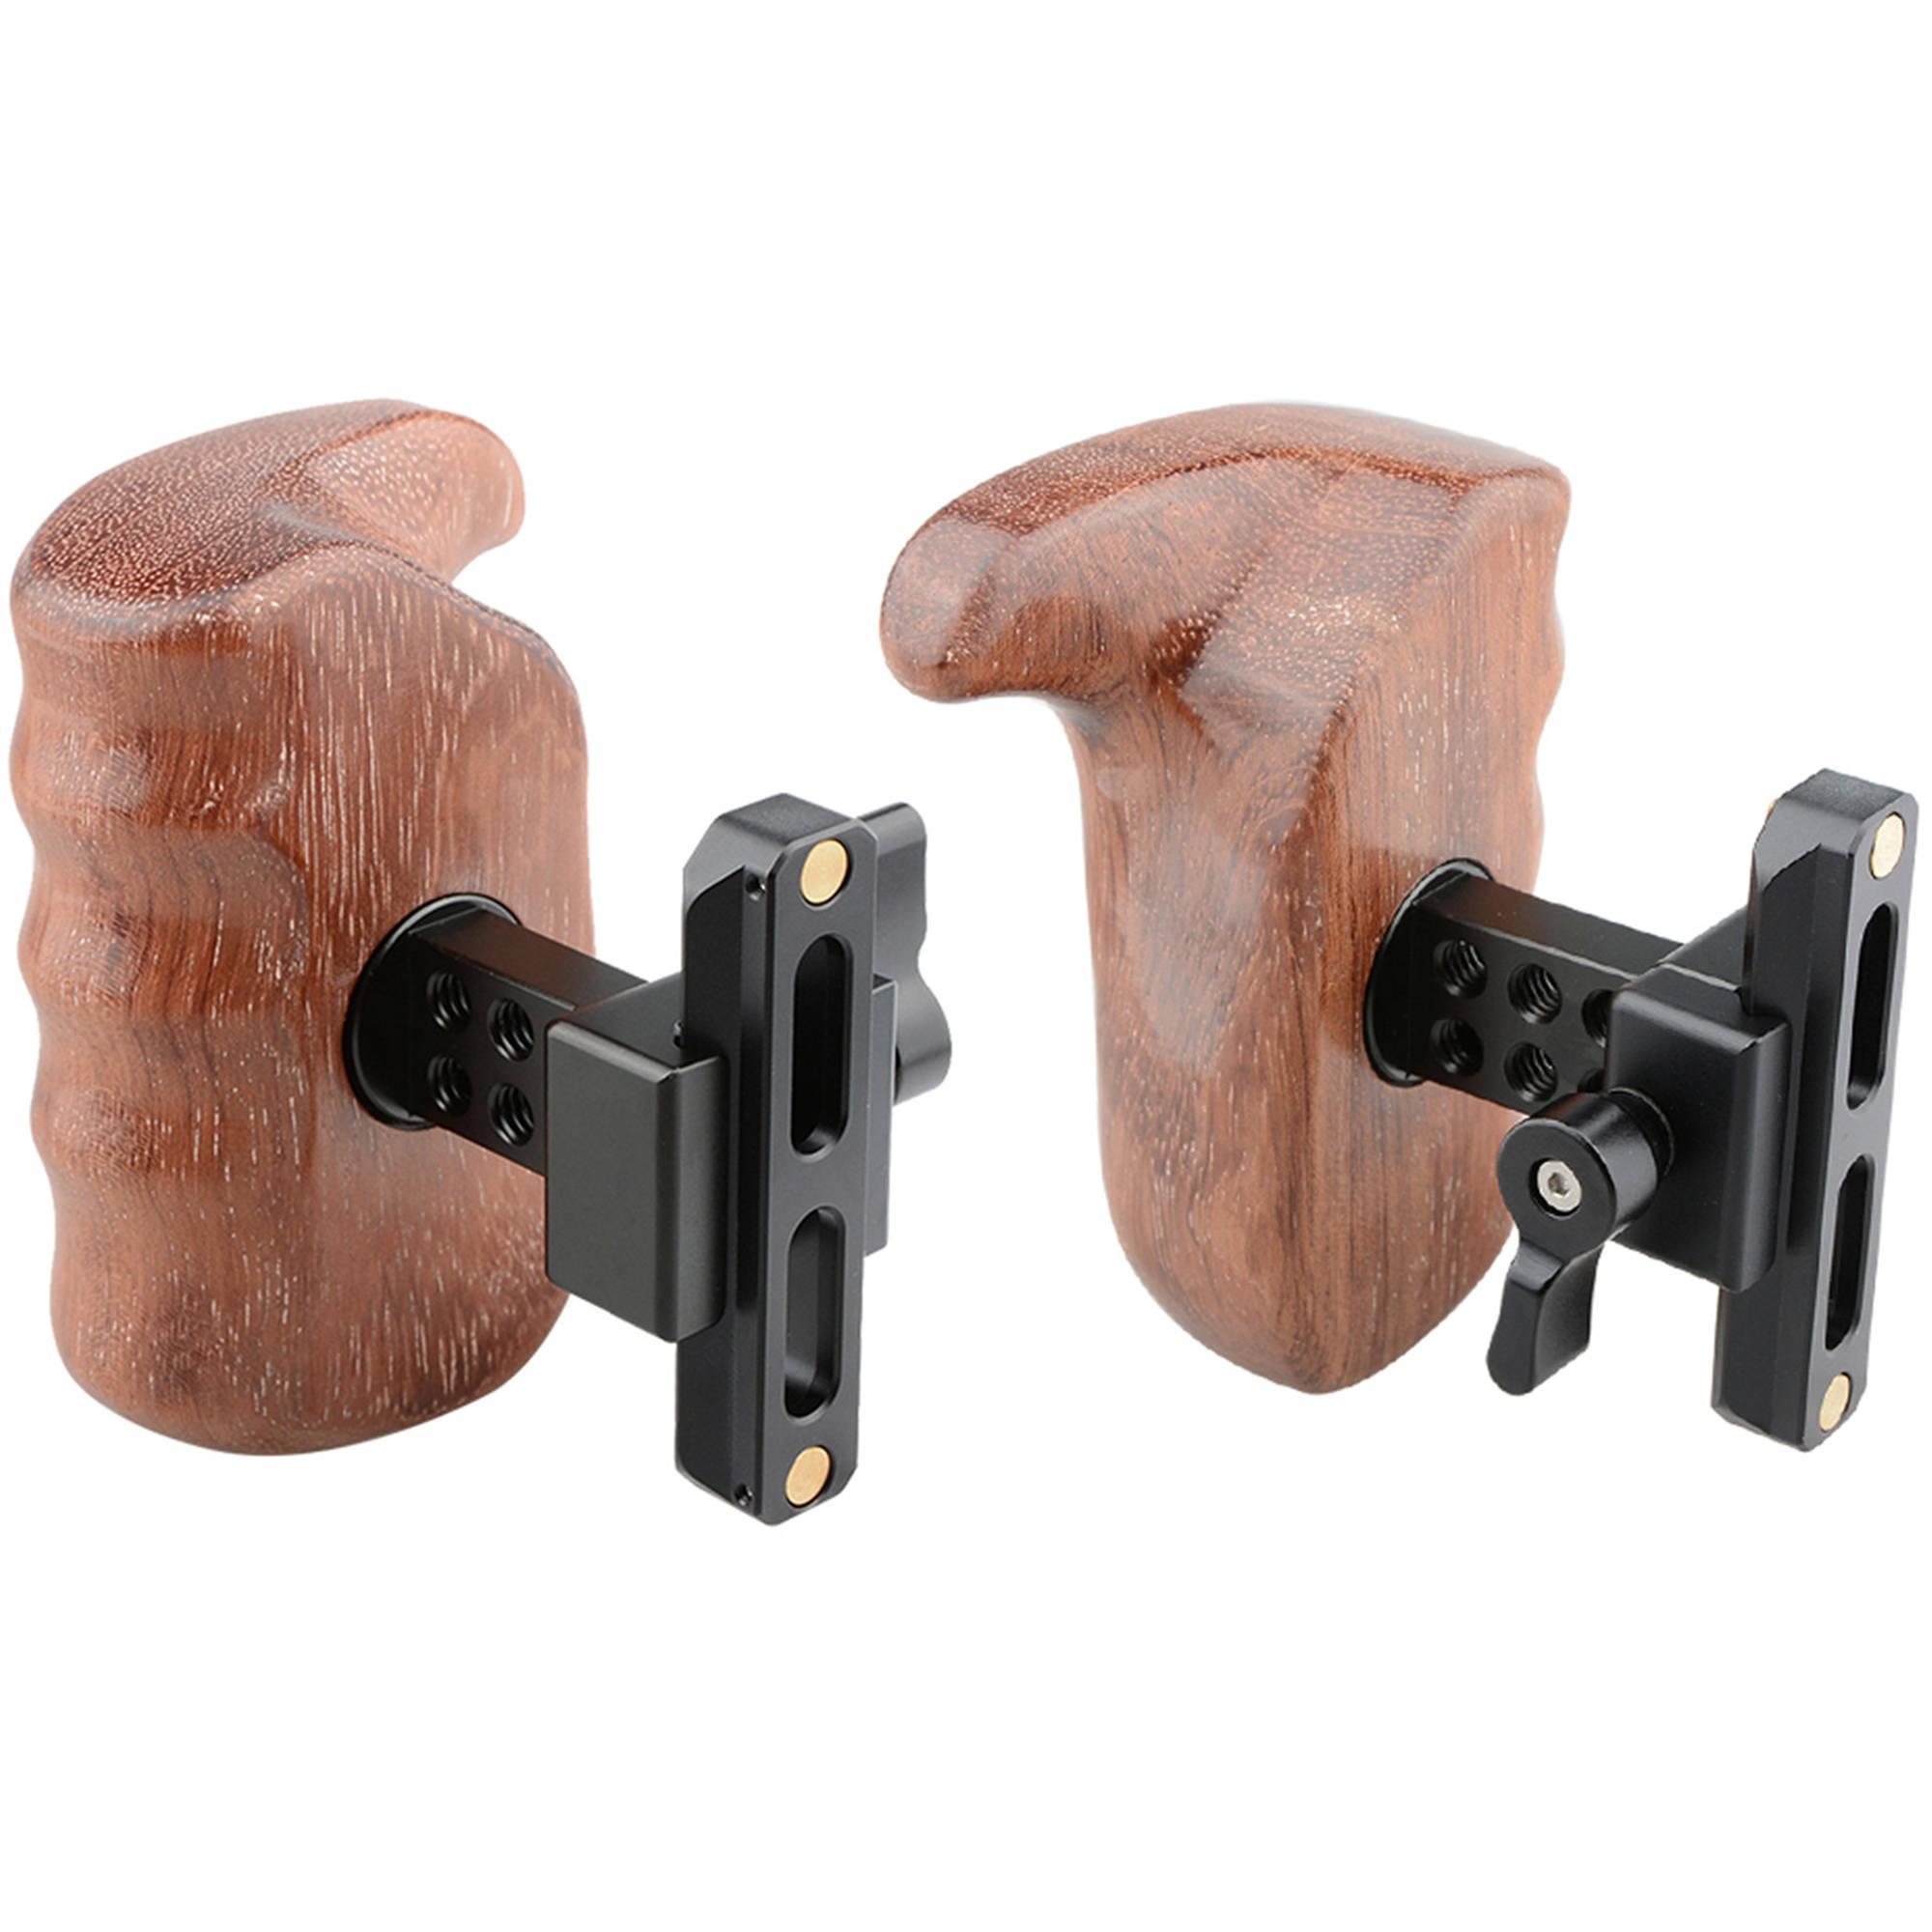 CAMVATE Wooden Handgrip for DSLR Camera Cage Bubinga,Right Hand